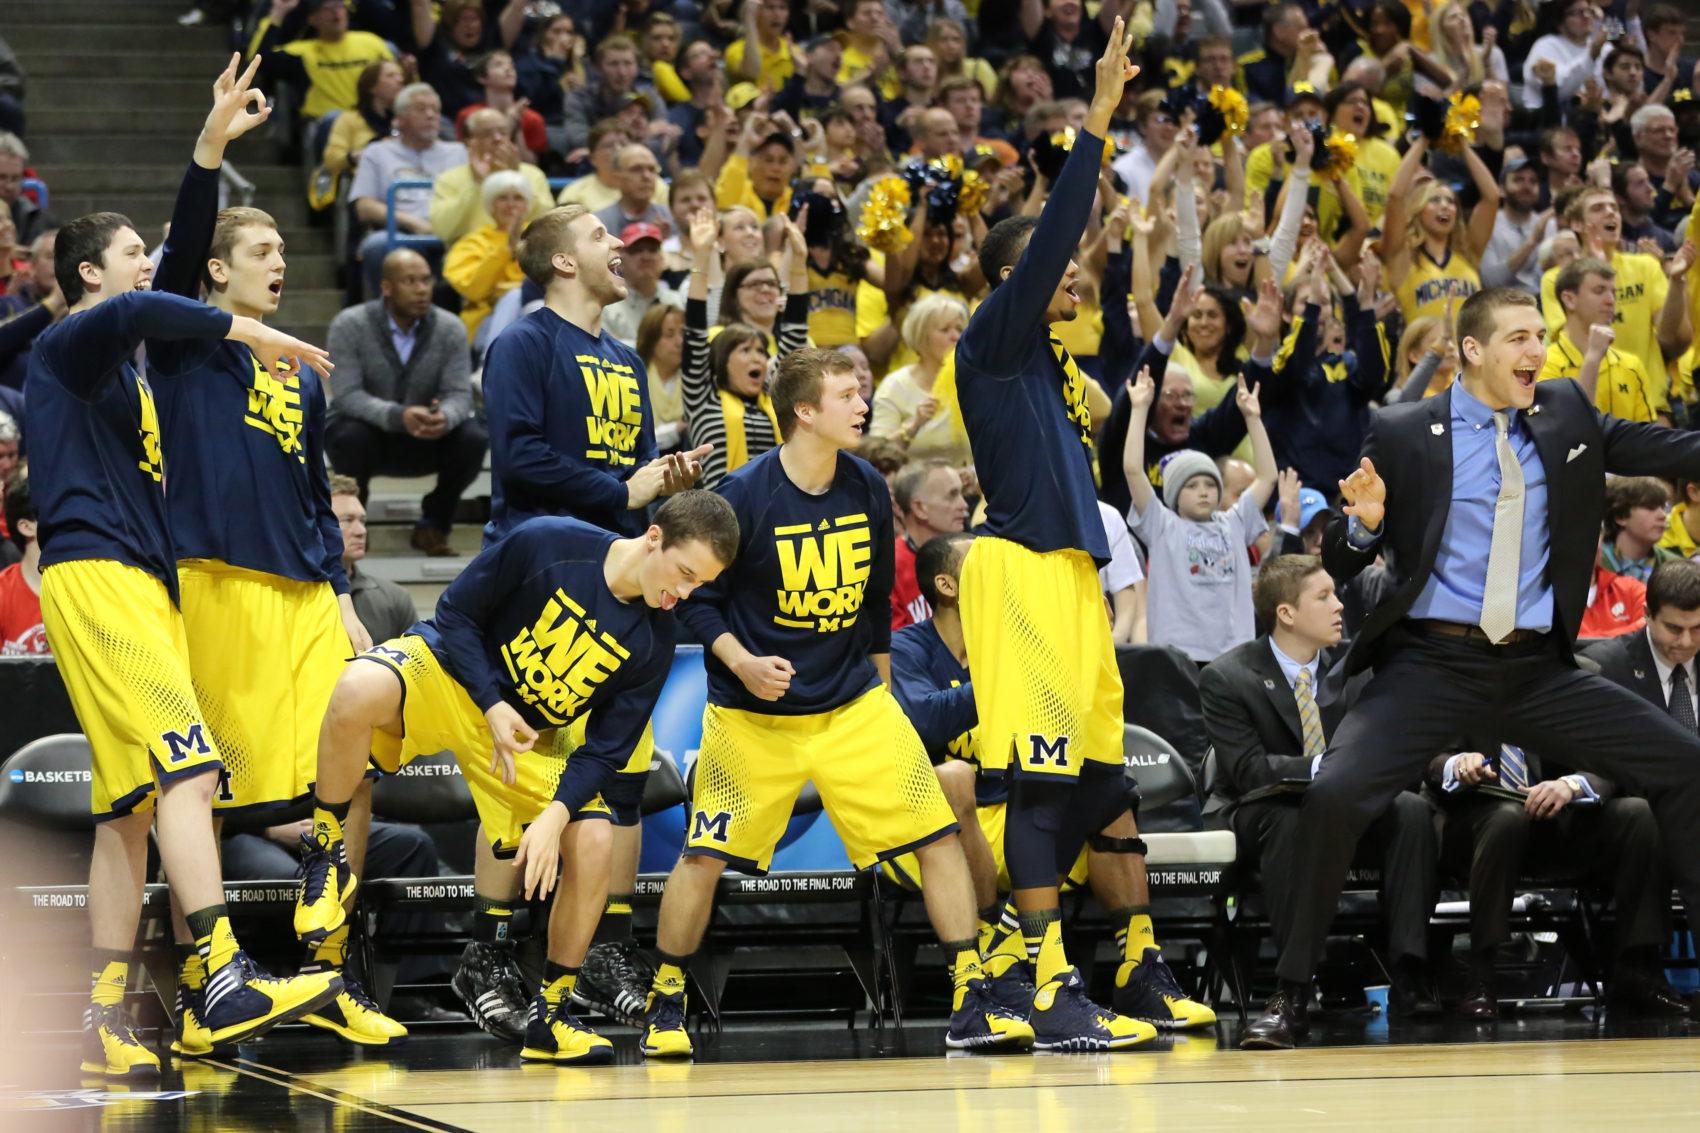 Michigan bench mob-42